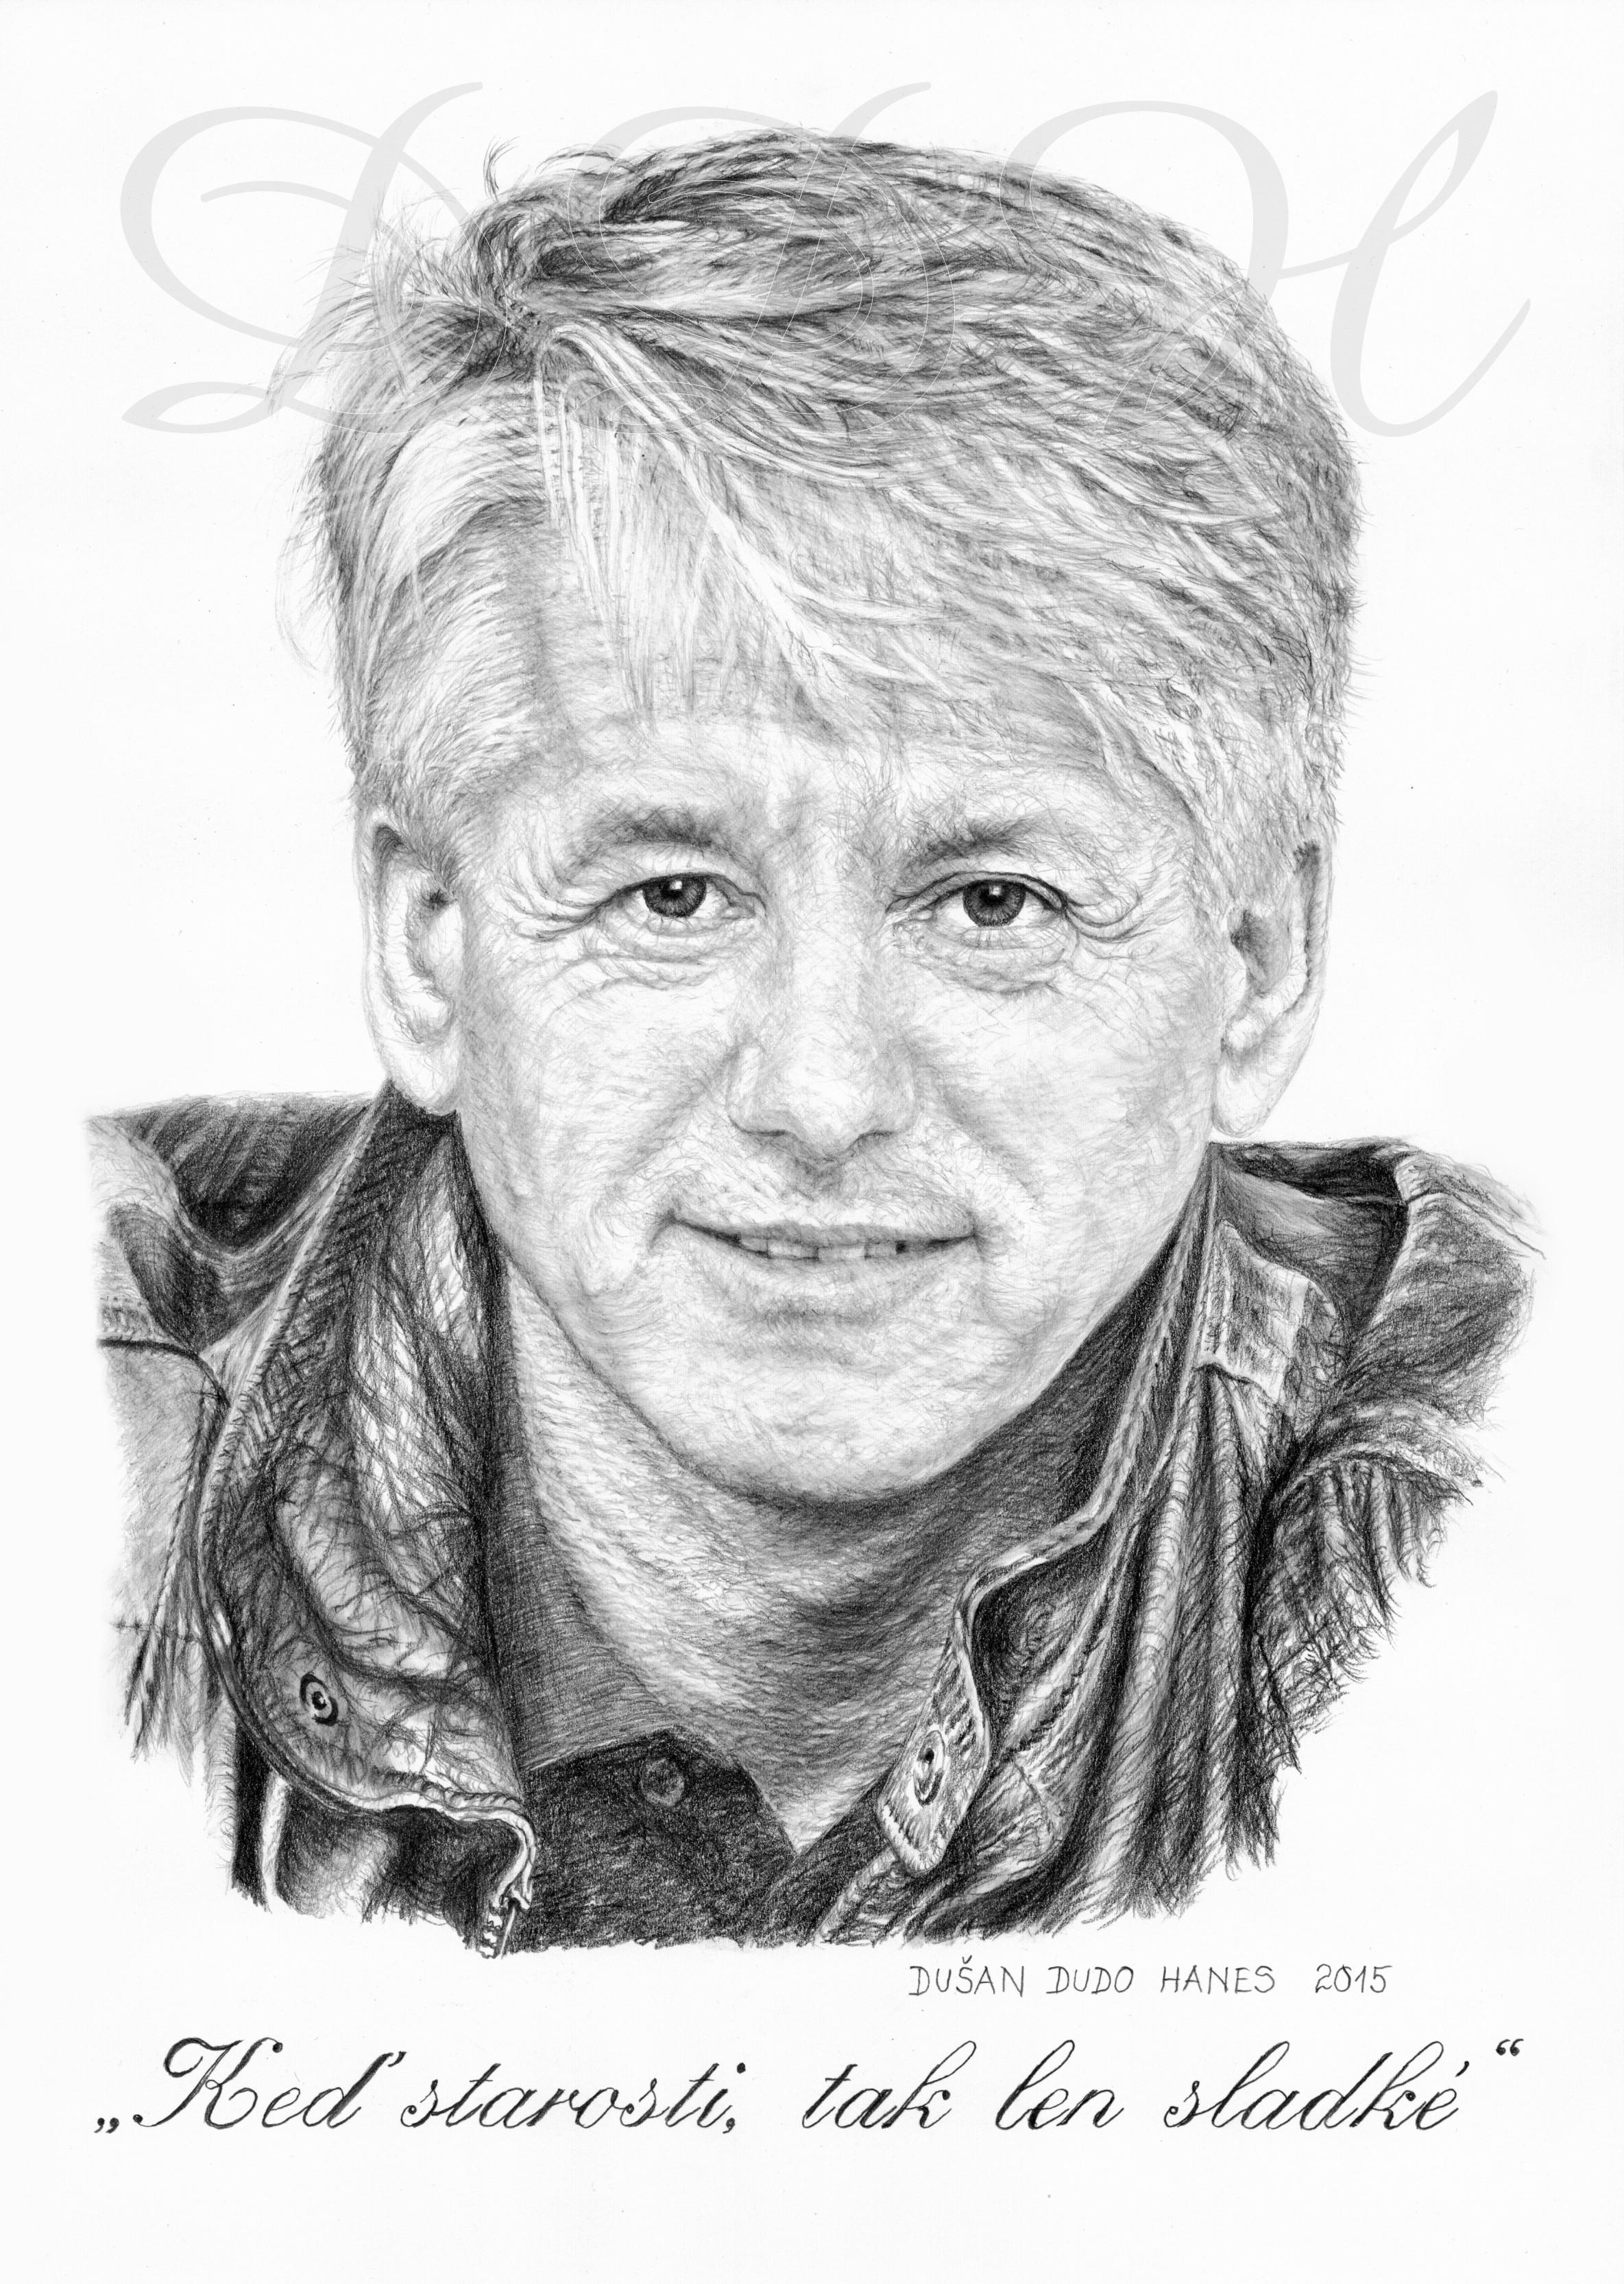 125 - Emil Horváth ml., portrét Dušan Dudo Hanes